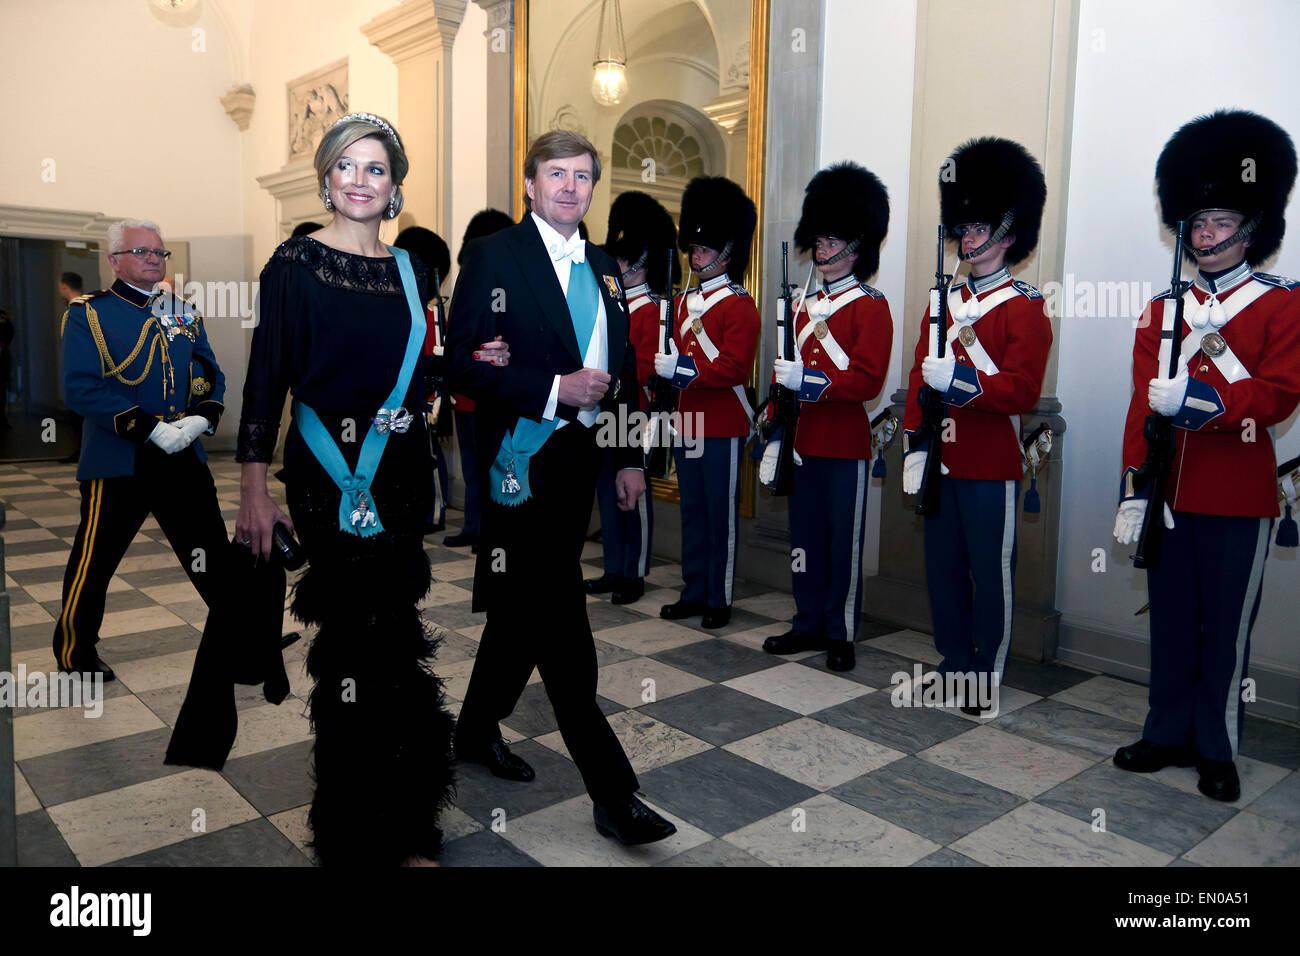 Copenhagen, Denmark, April15th, 2015. H. M. Dutch King Willem-Alexander and Queen Maxima arrive to Christiansborg - Stock Image